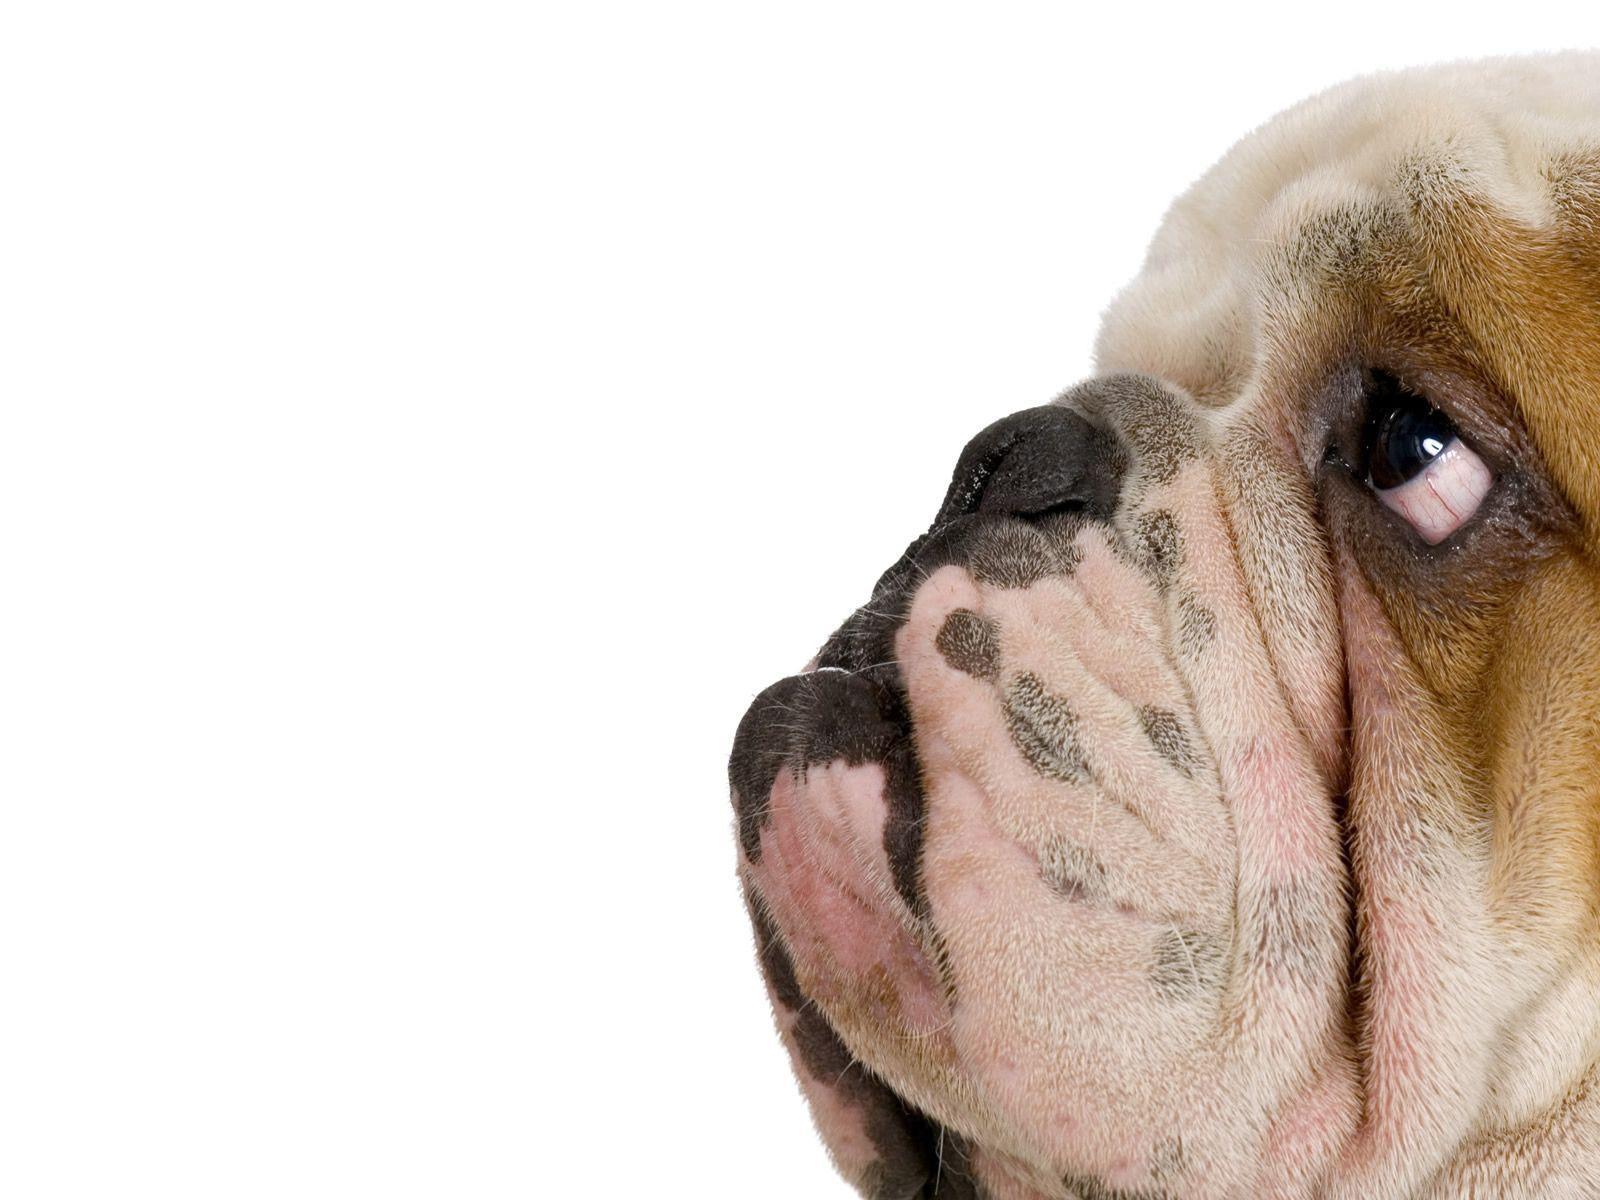 Bulldog Wallpapers Top Free Bulldog Backgrounds Wallpaperaccess